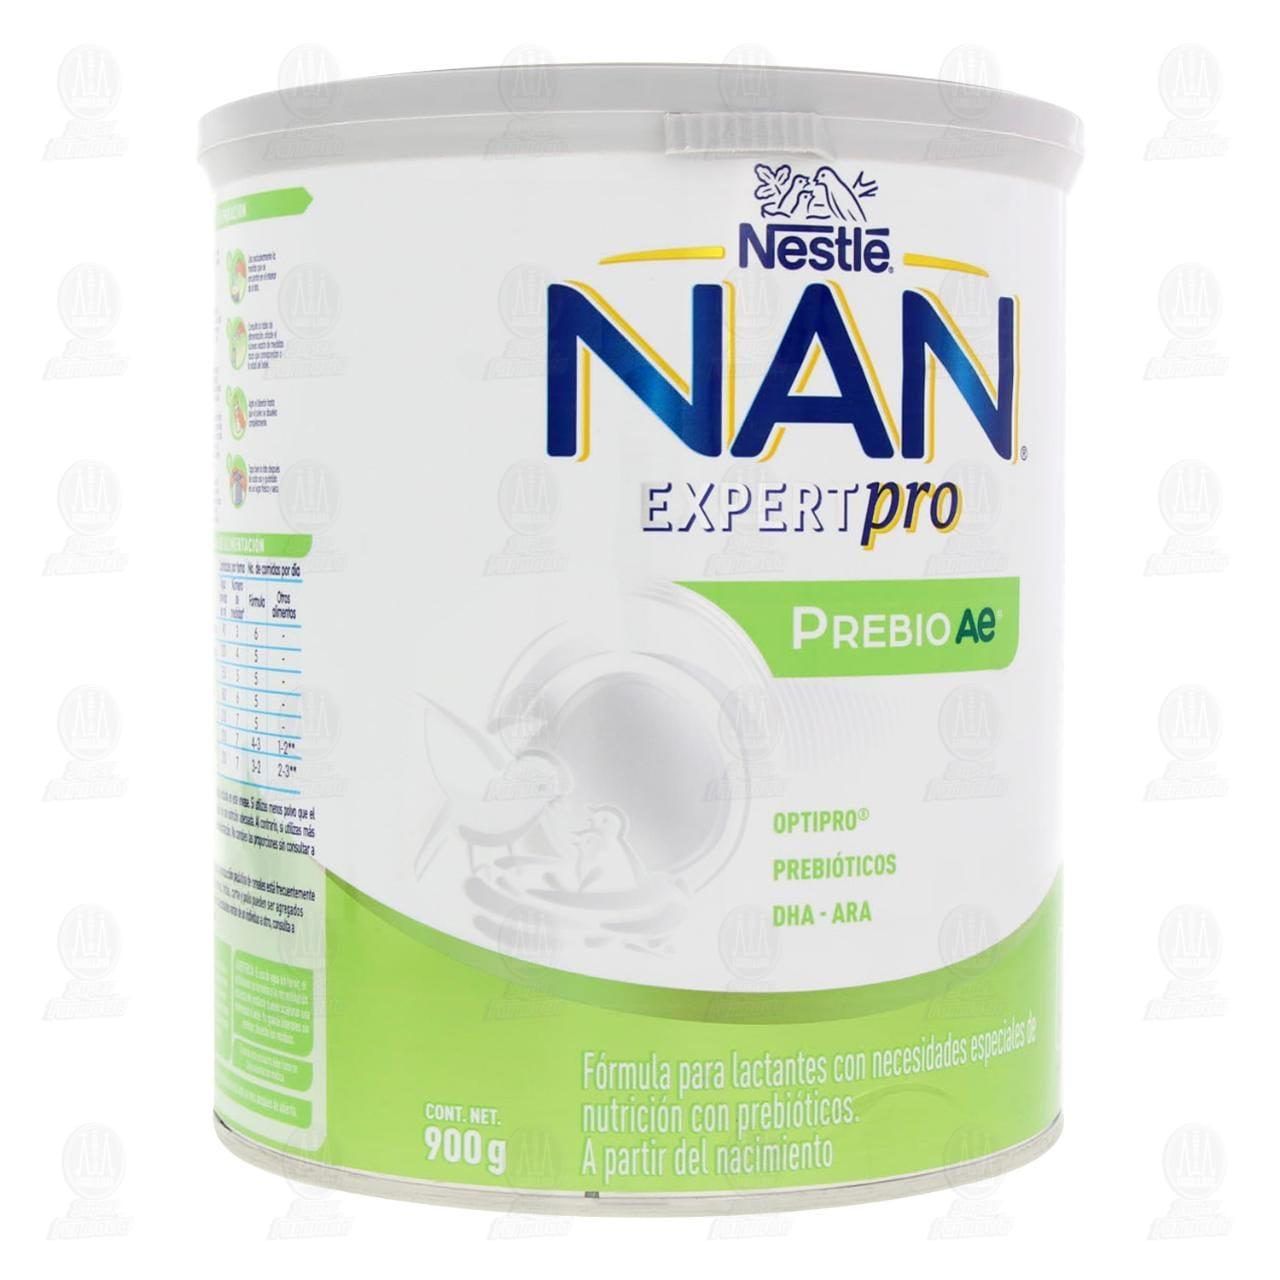 Comprar Fórmula Infantil NAN Expert Pro Prebio Ae (A Partir del Nacimiento), 900 gr. en Farmacias Guadalajara